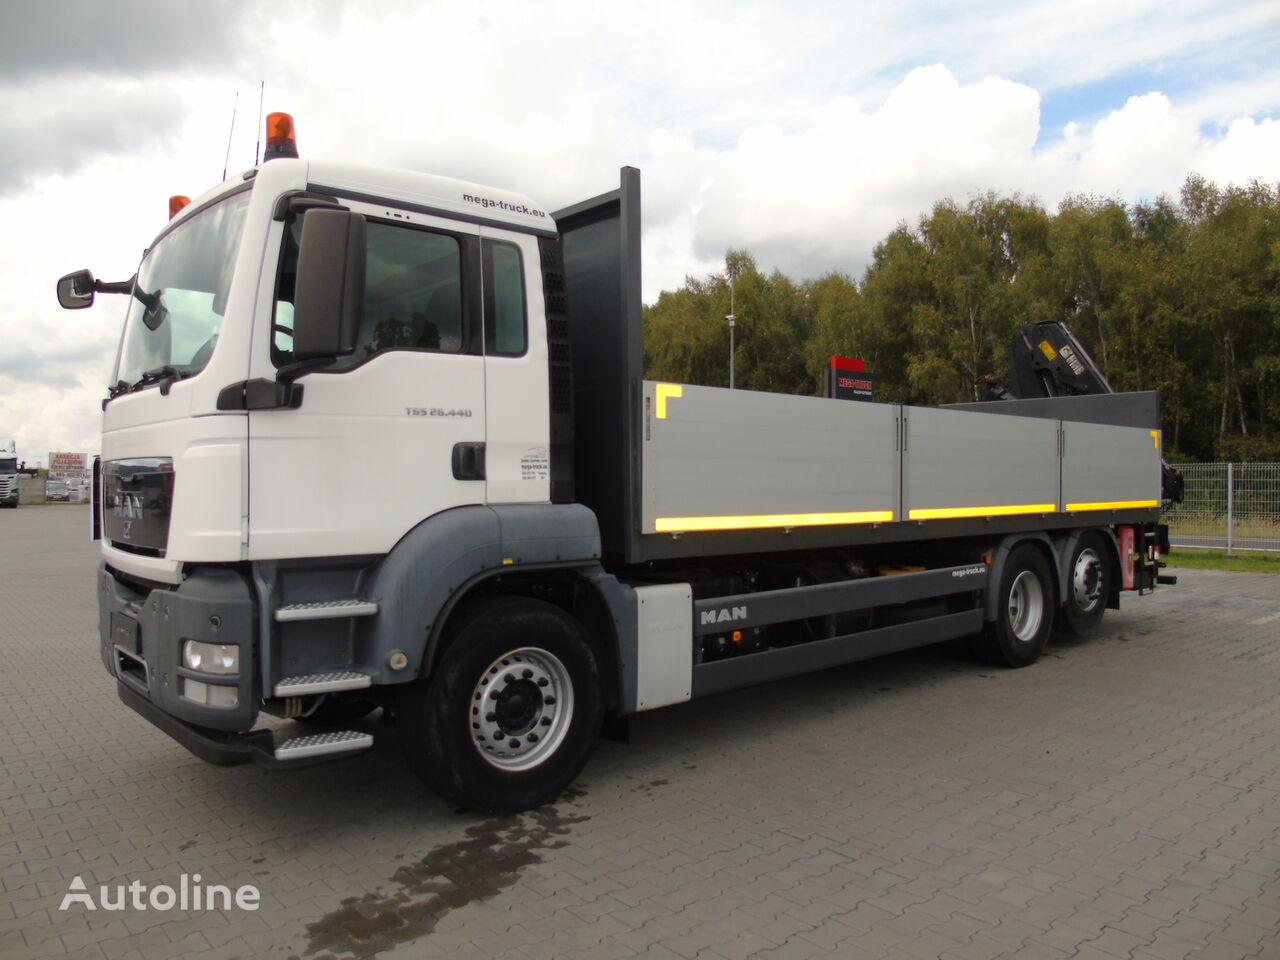 MAN TGS 26.440 6X2 HIAB XS 122 HIDUO-RADIOWY flatbed truck